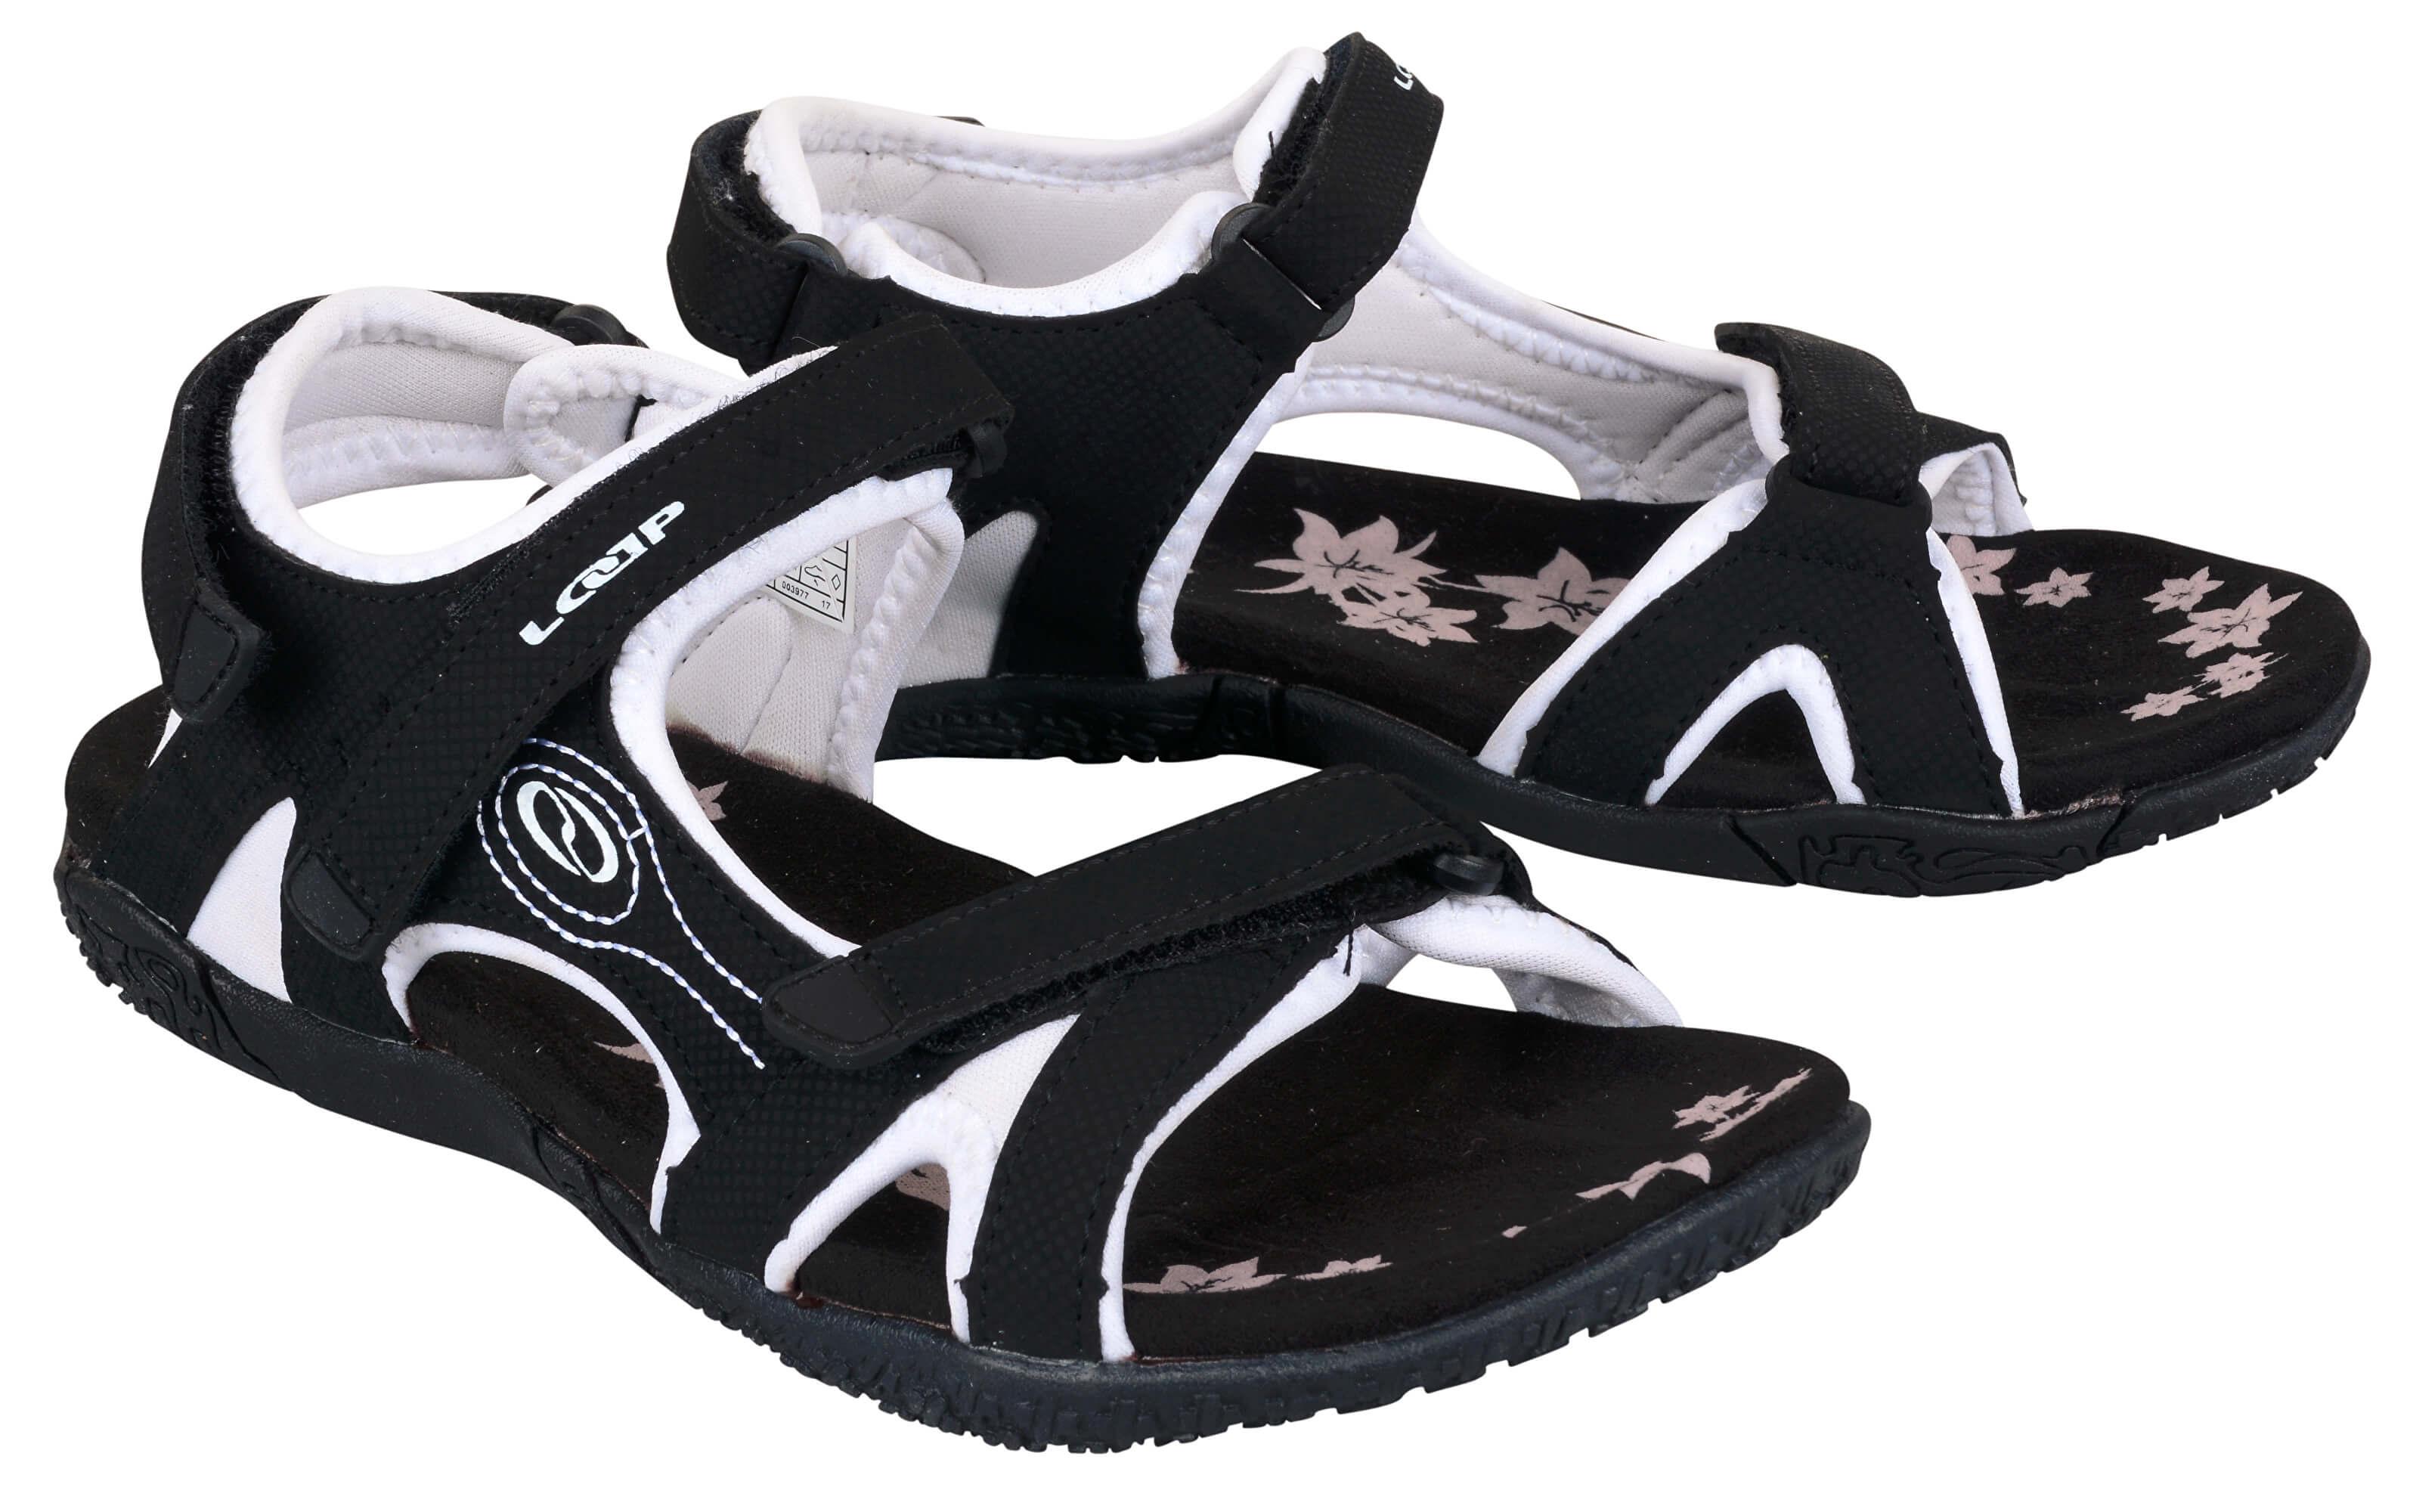 0d2aeaa08ee1 LOAP Dámske sandále Caffa Black Bl de Blanc čierno-biele SSL1758 ...